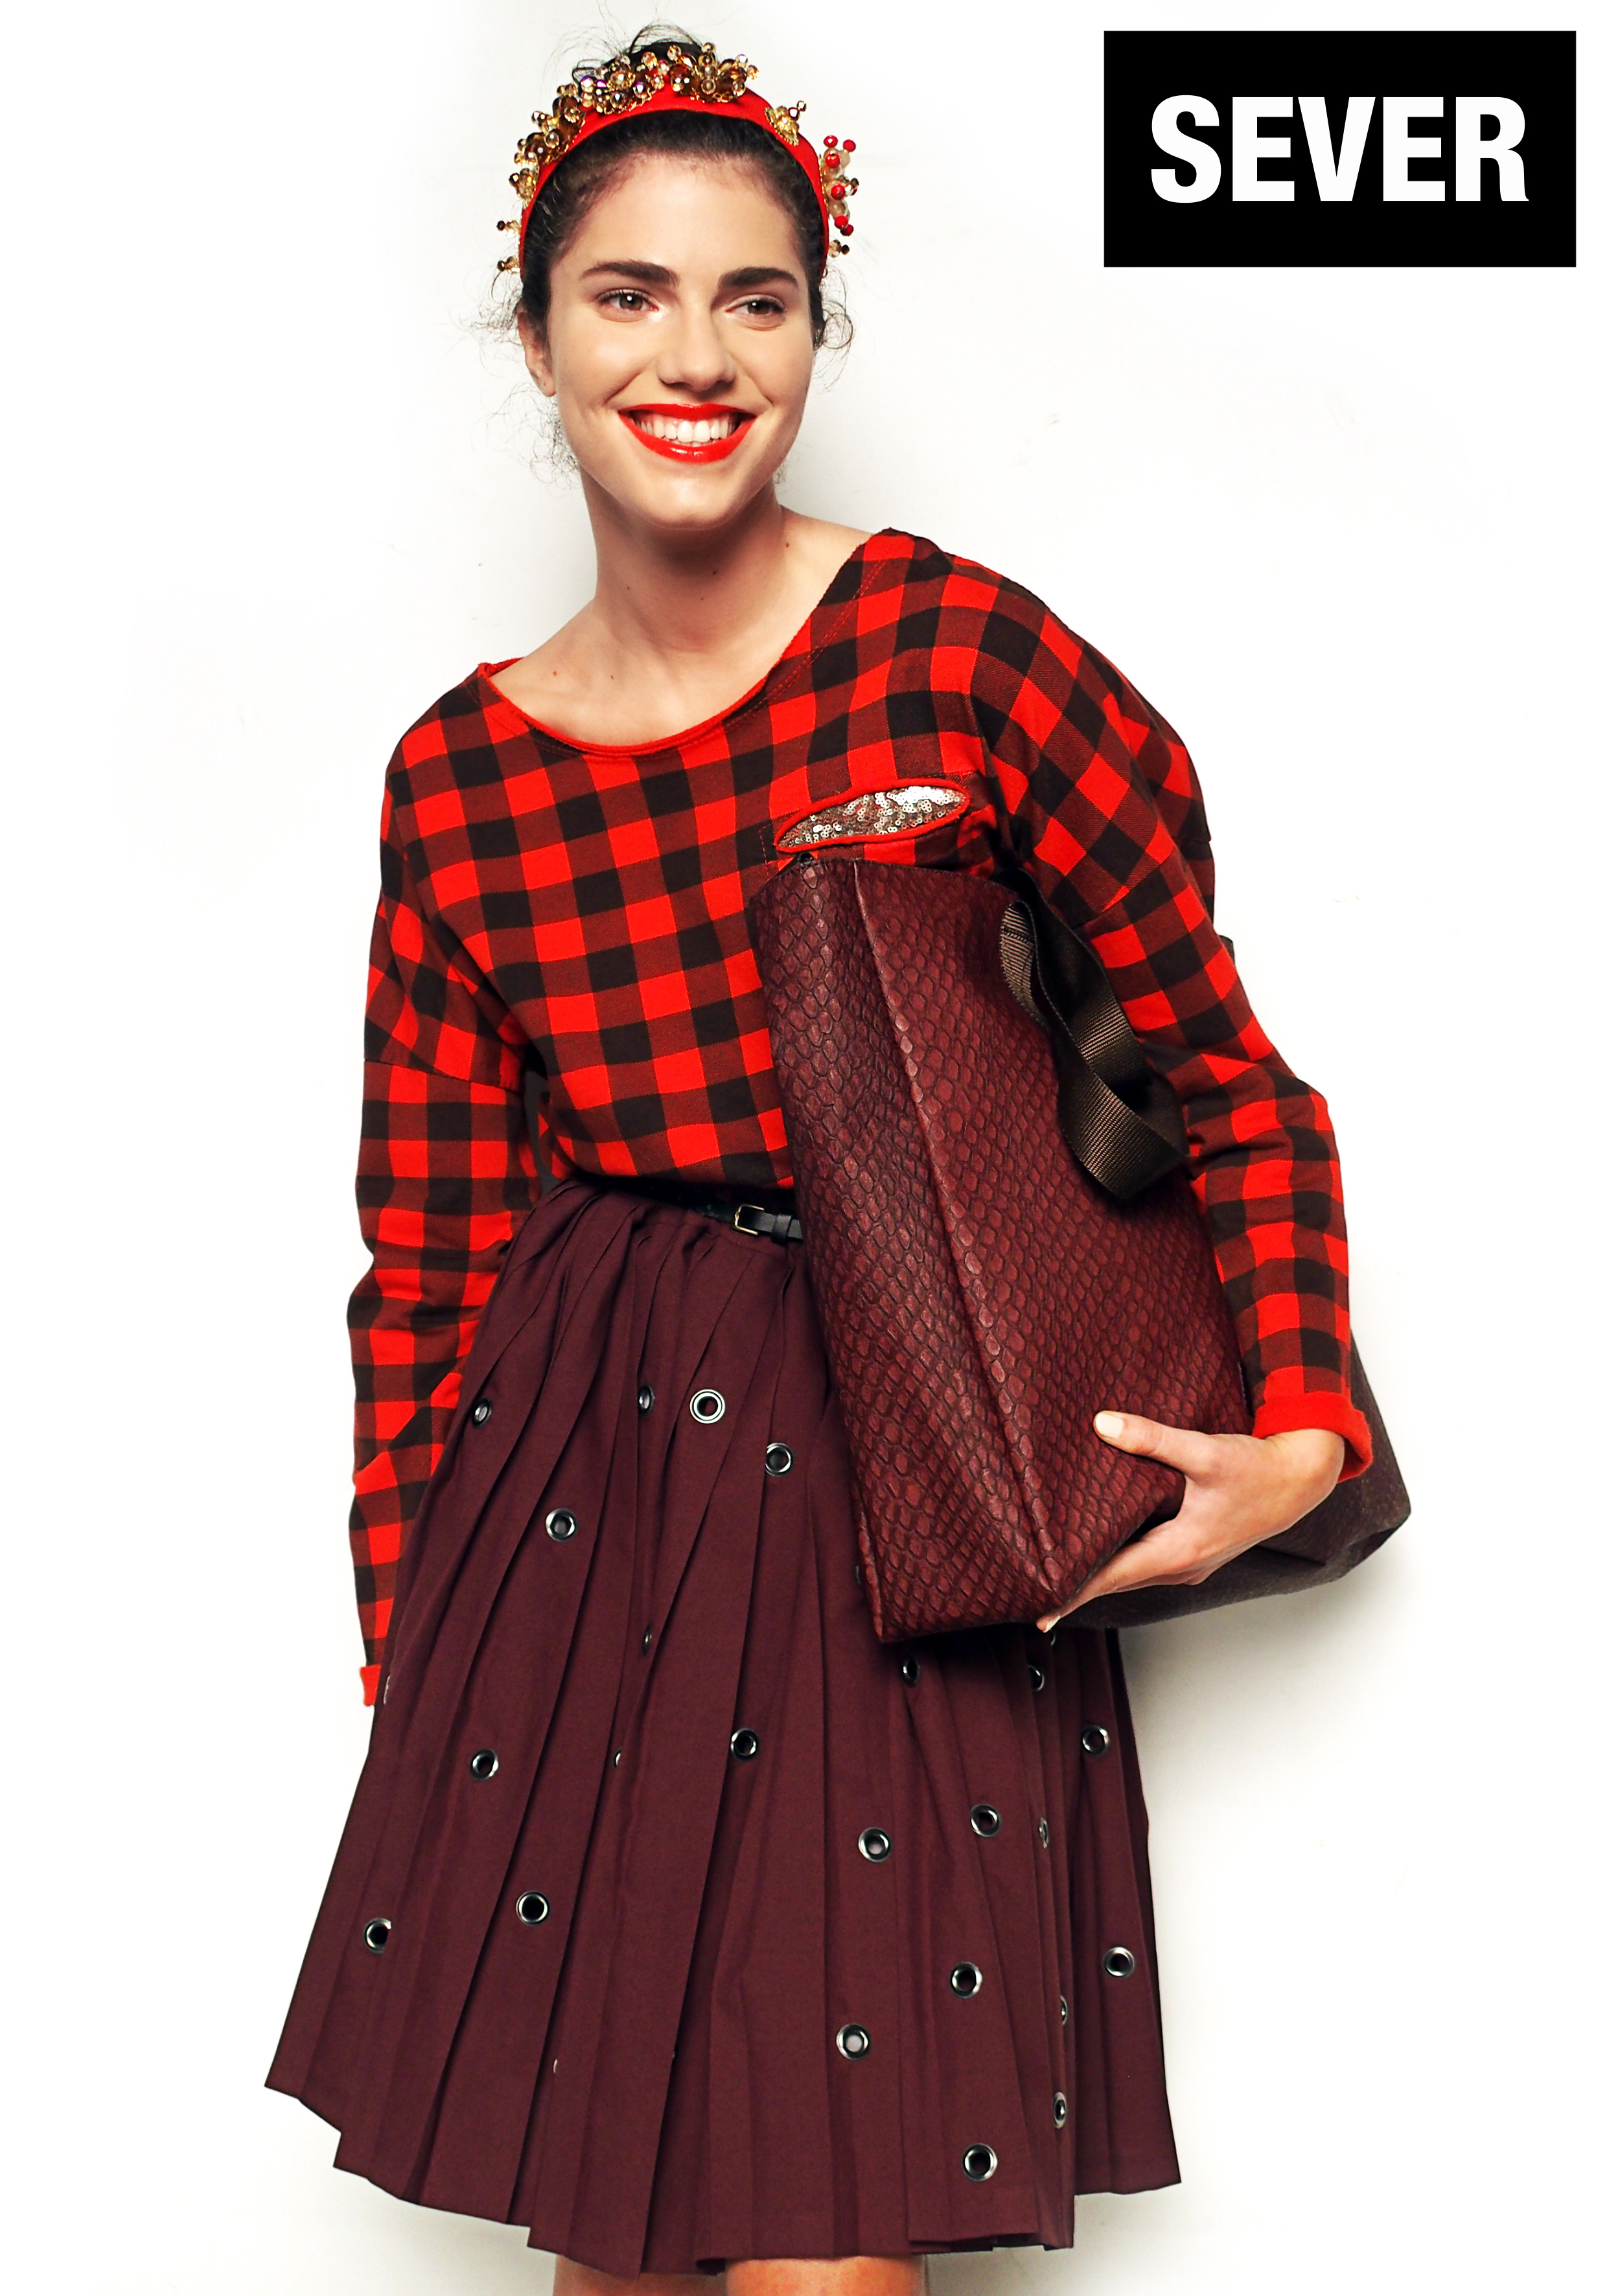 robert-sever-streetwear-kolekcija-2016 (13).jpg